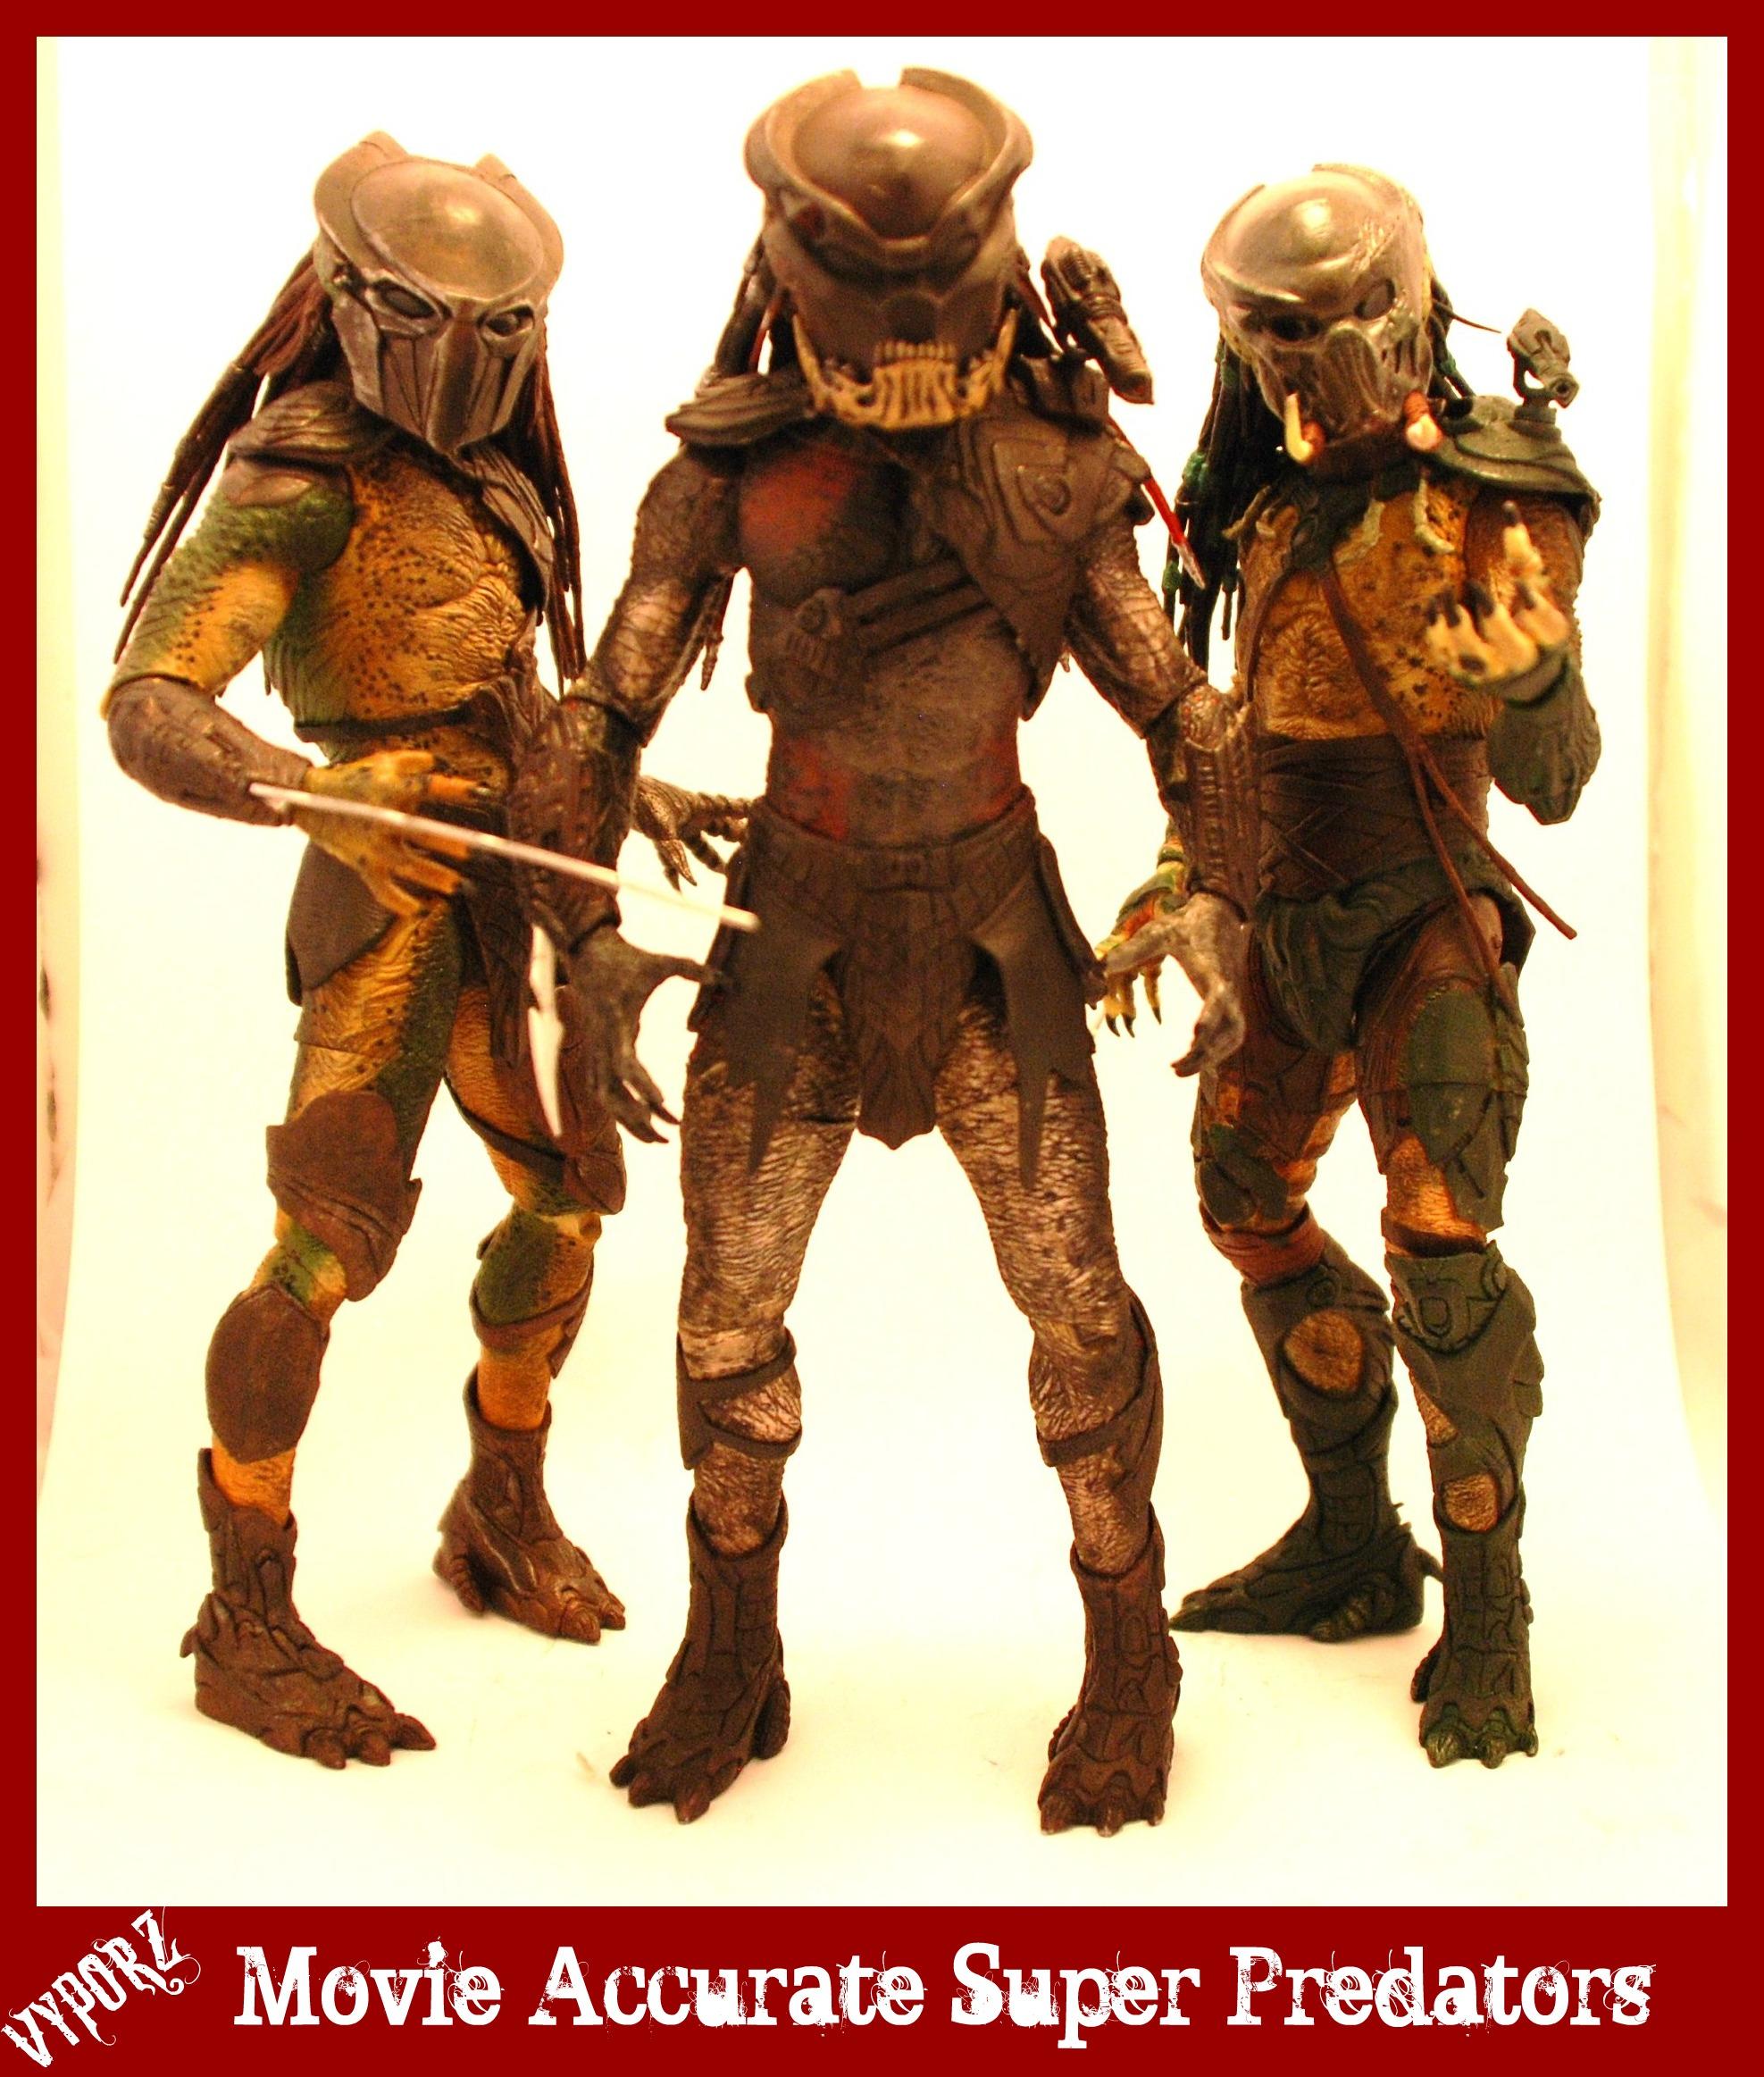 Movie_Accurate_Super_Predators.jpg